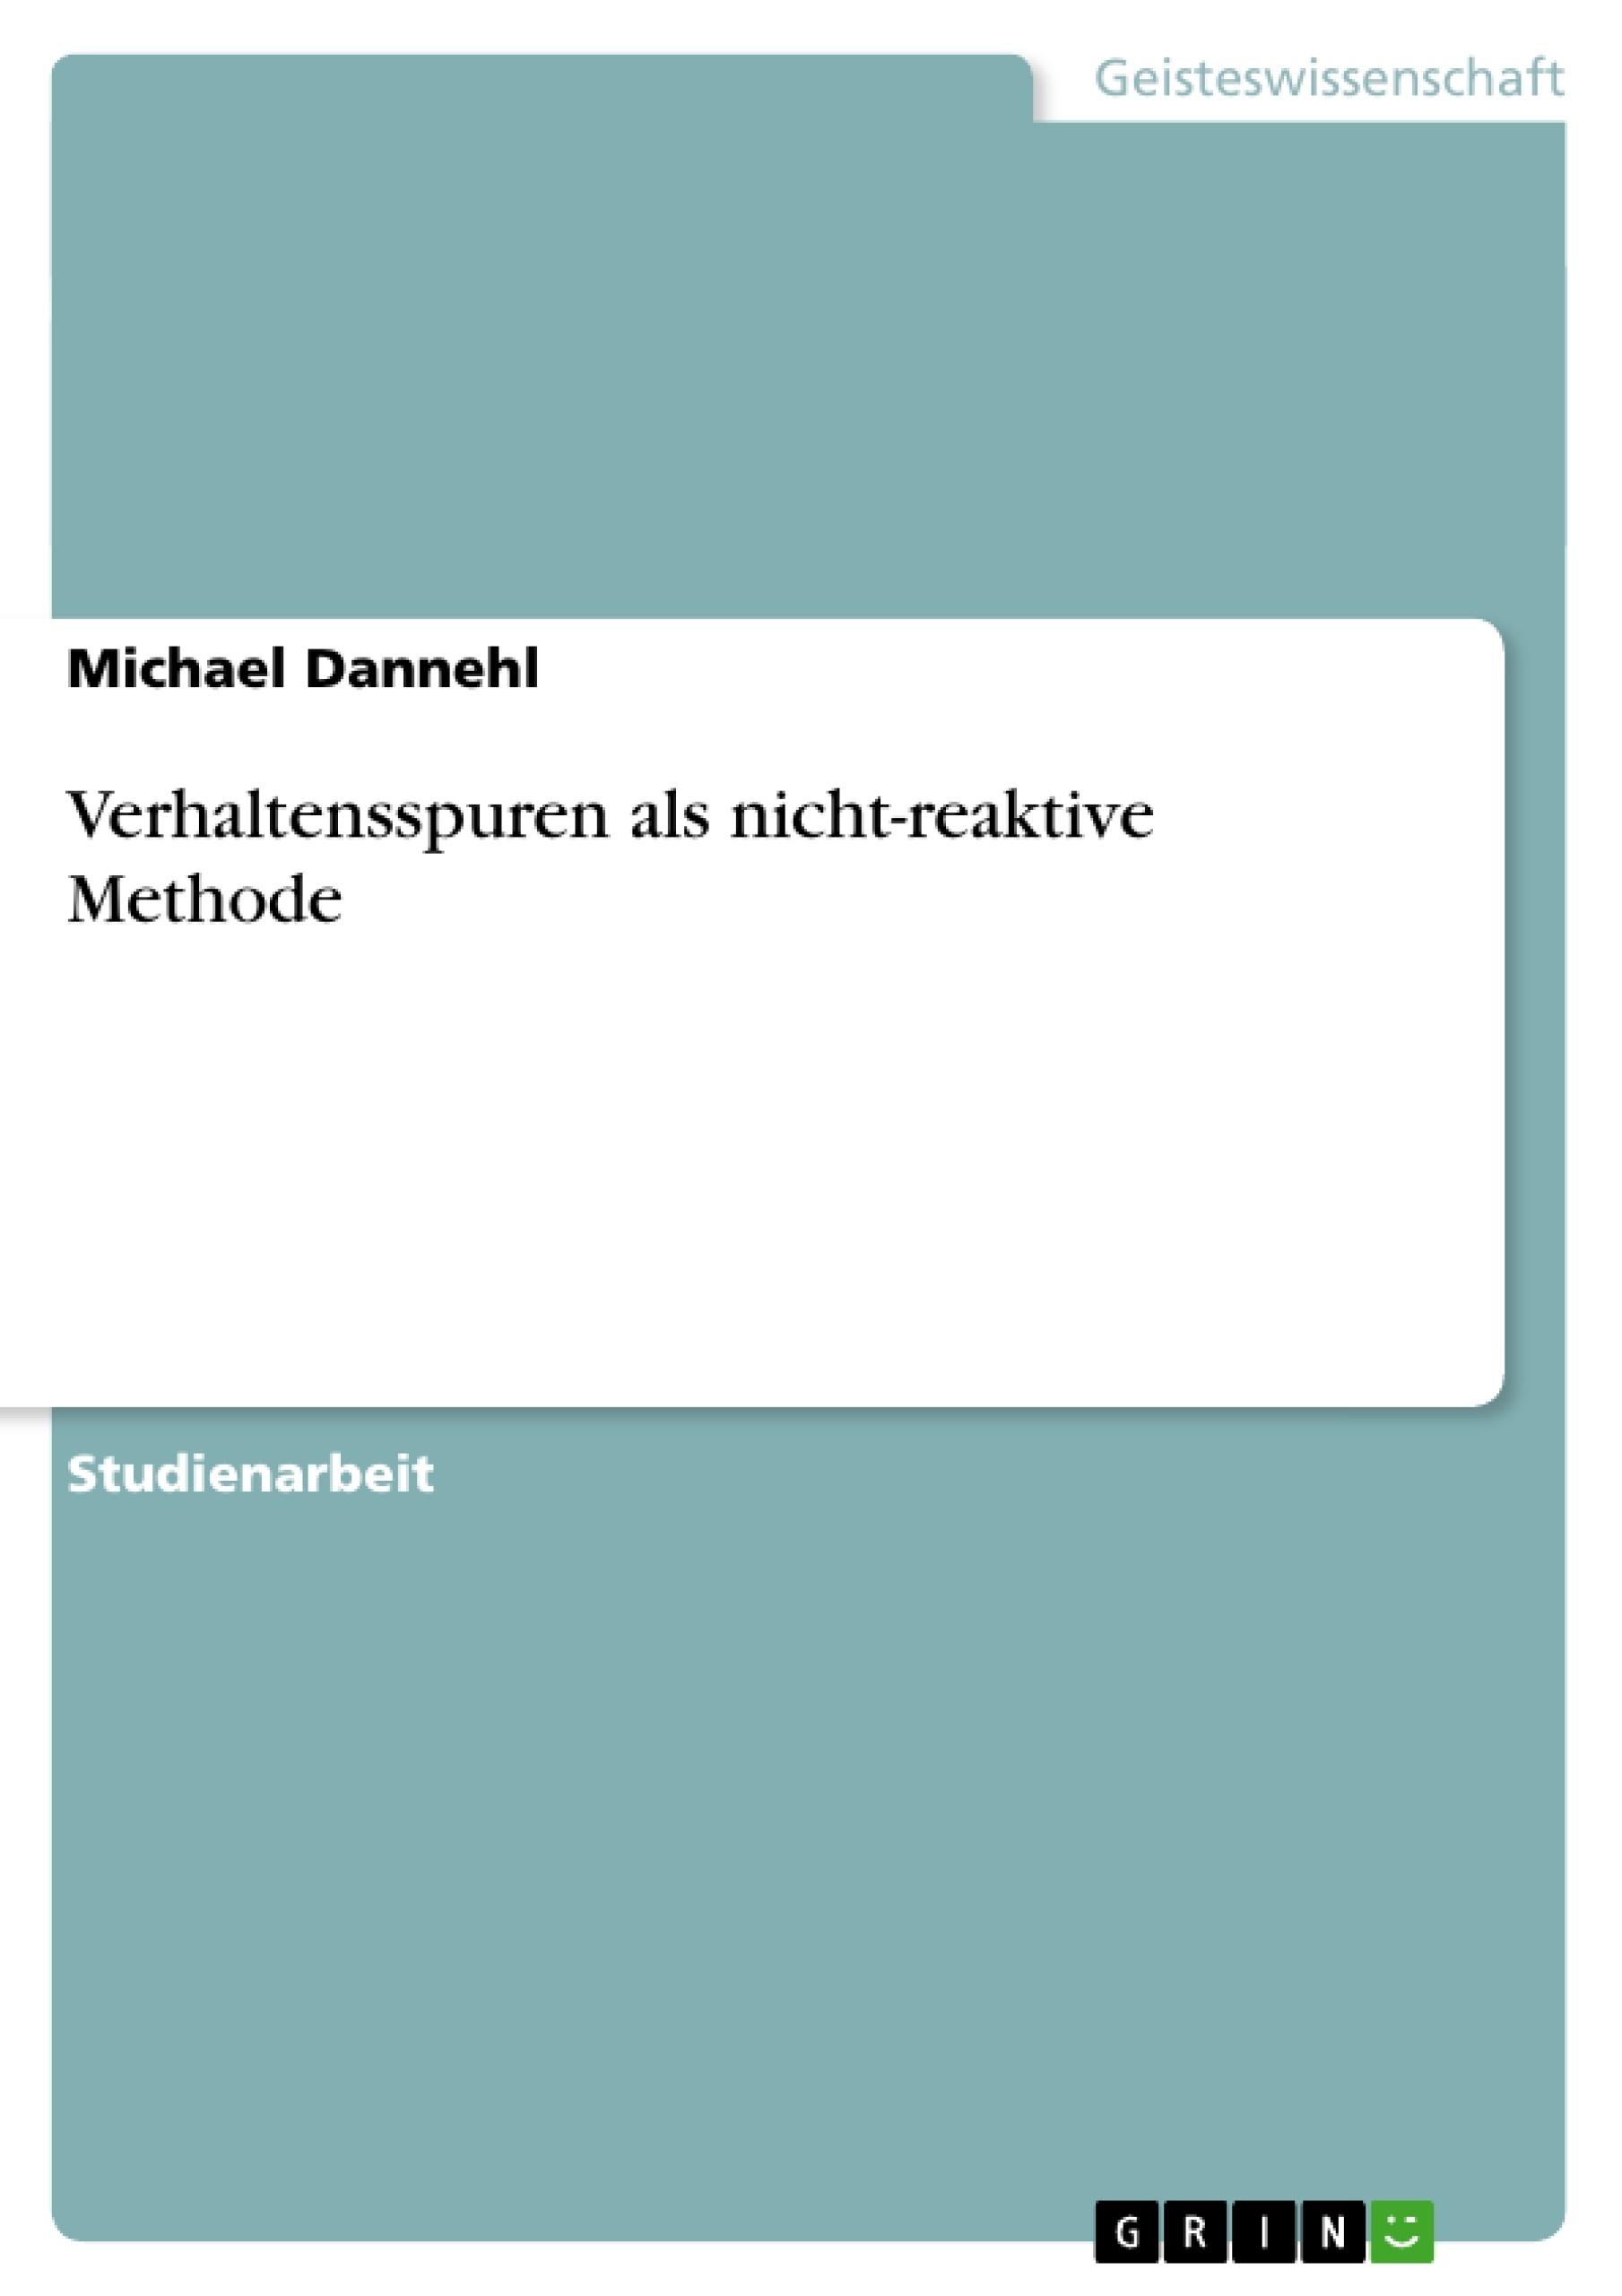 Titel: Verhaltensspuren als nicht-reaktive Methode